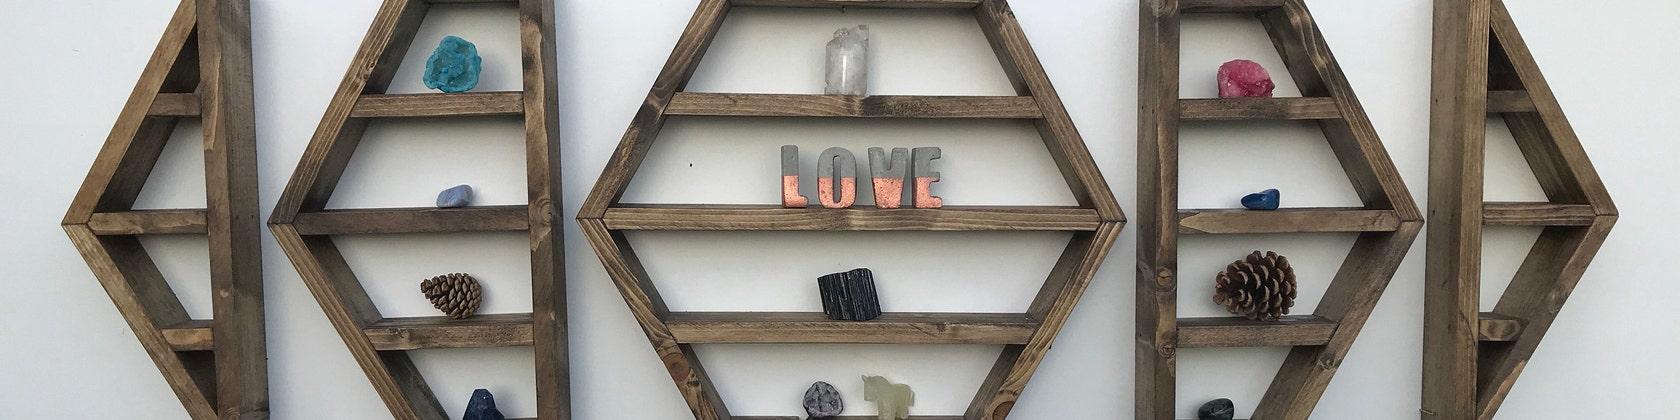 Lovelifewood